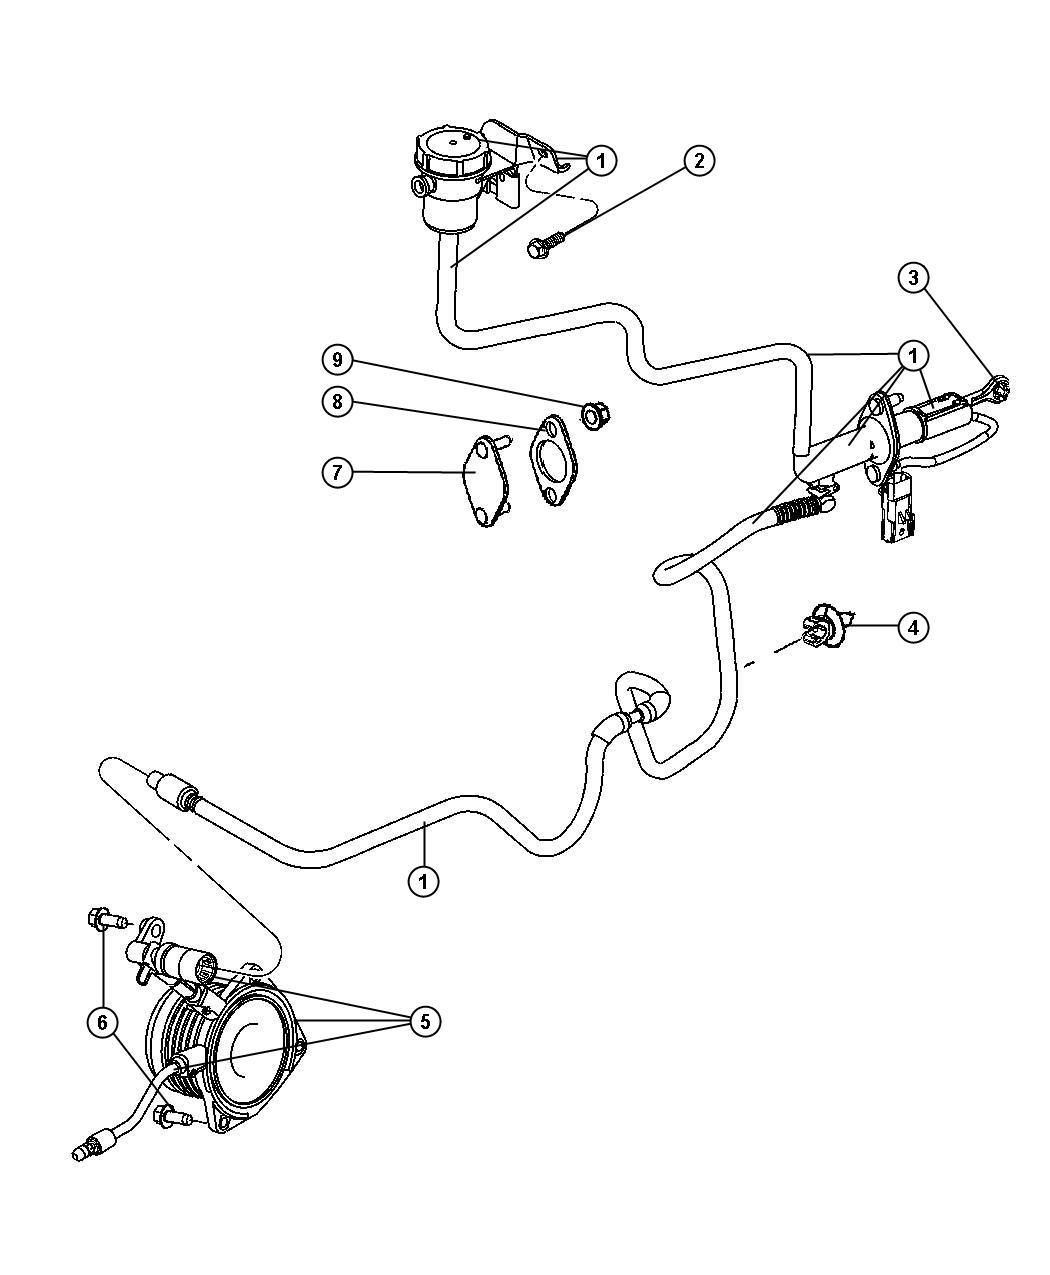 Chrysler PT Cruiser Bushing. Hydraulic clutch actuator